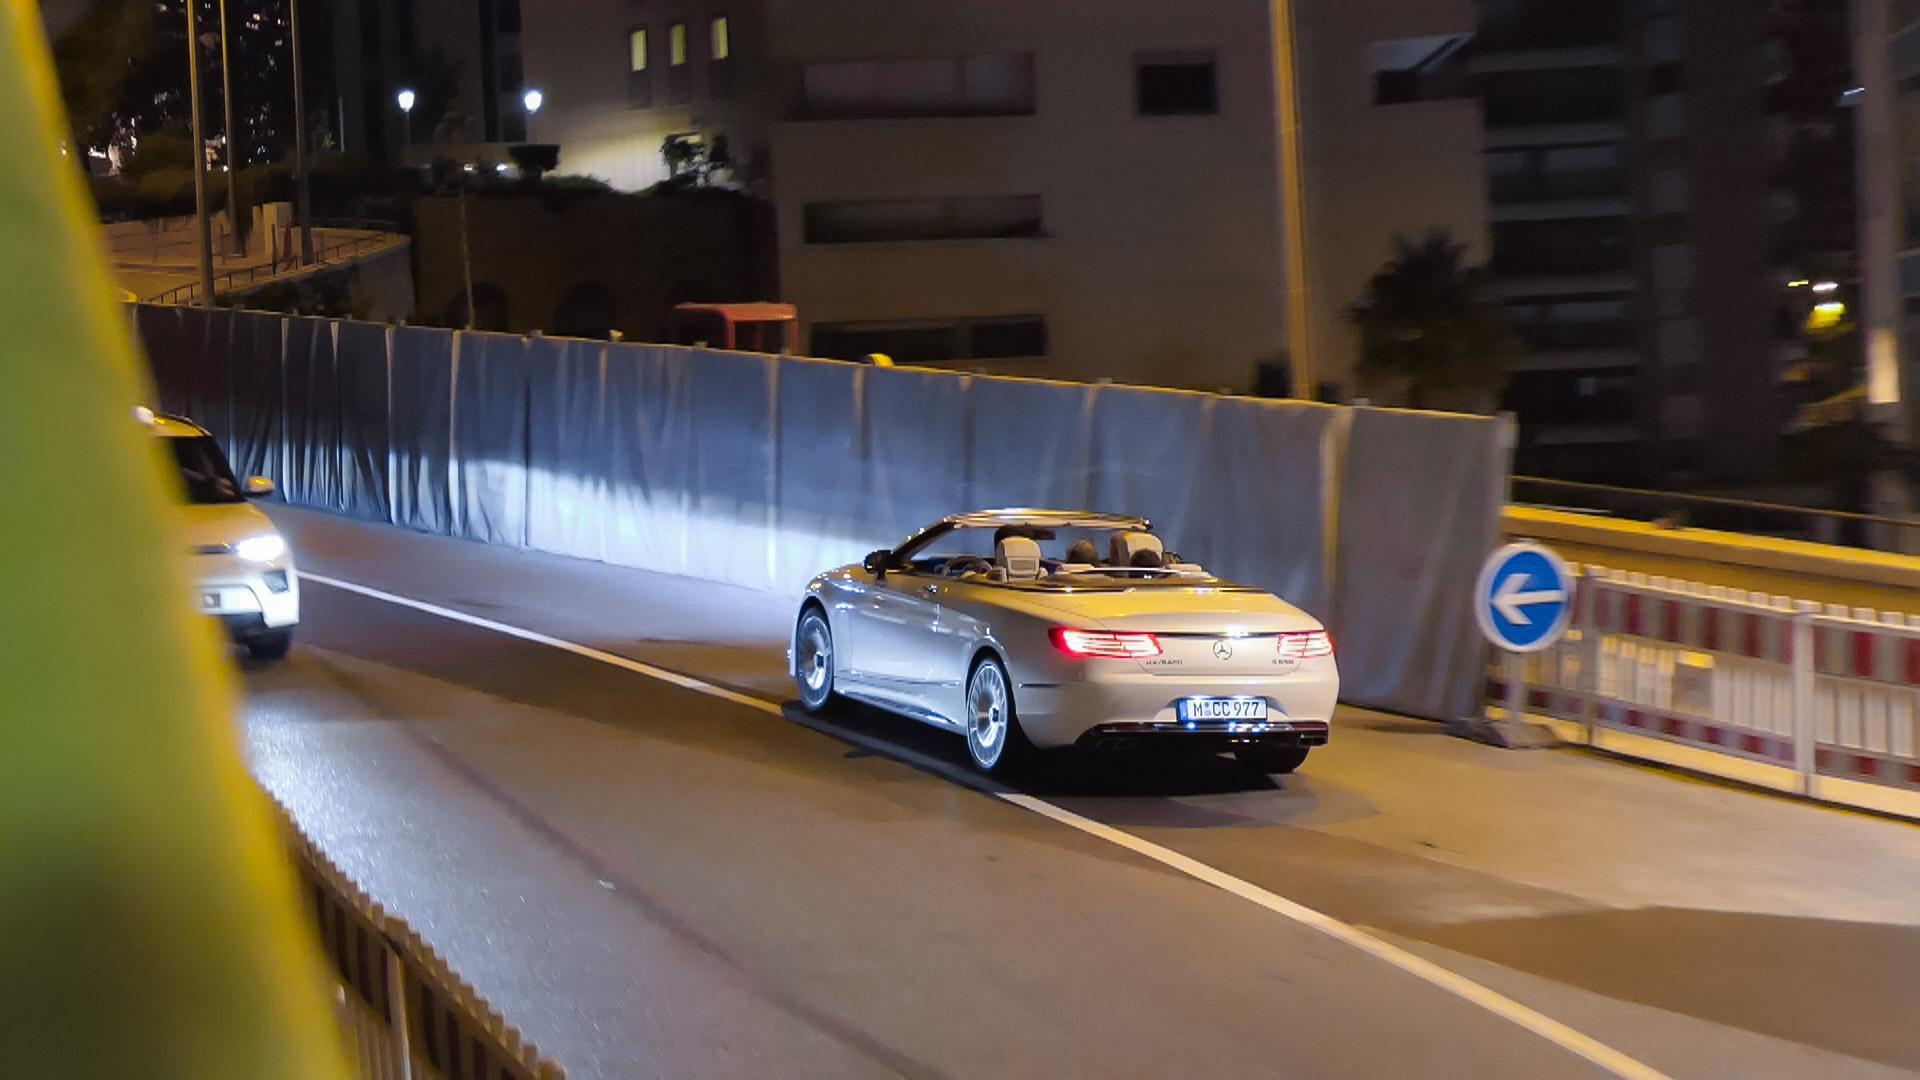 Mercedes-Maybach S 650 Cabrio (1of300) - M-CC-977